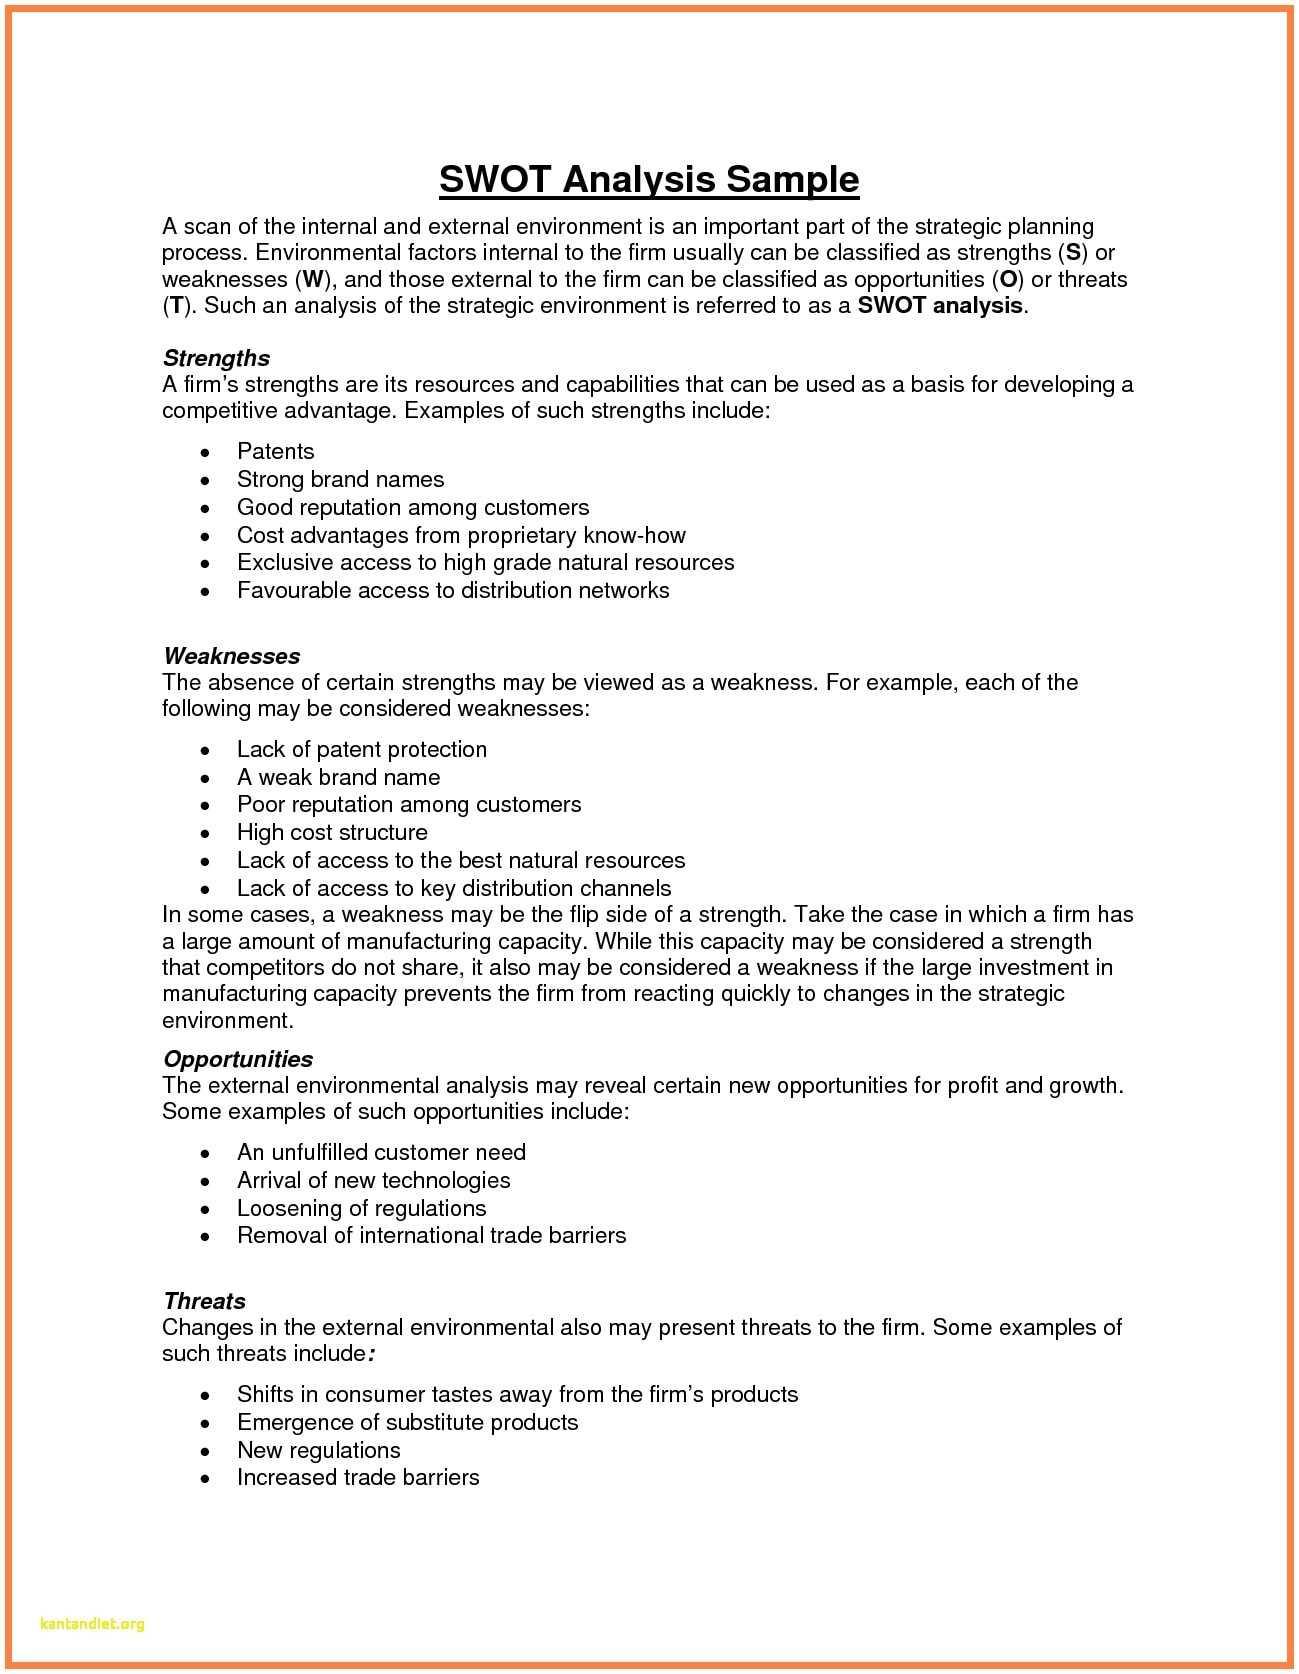 9+ Strategic Analysis Report Examples - Pdf | Examples Throughout Strategic Analysis Report Template